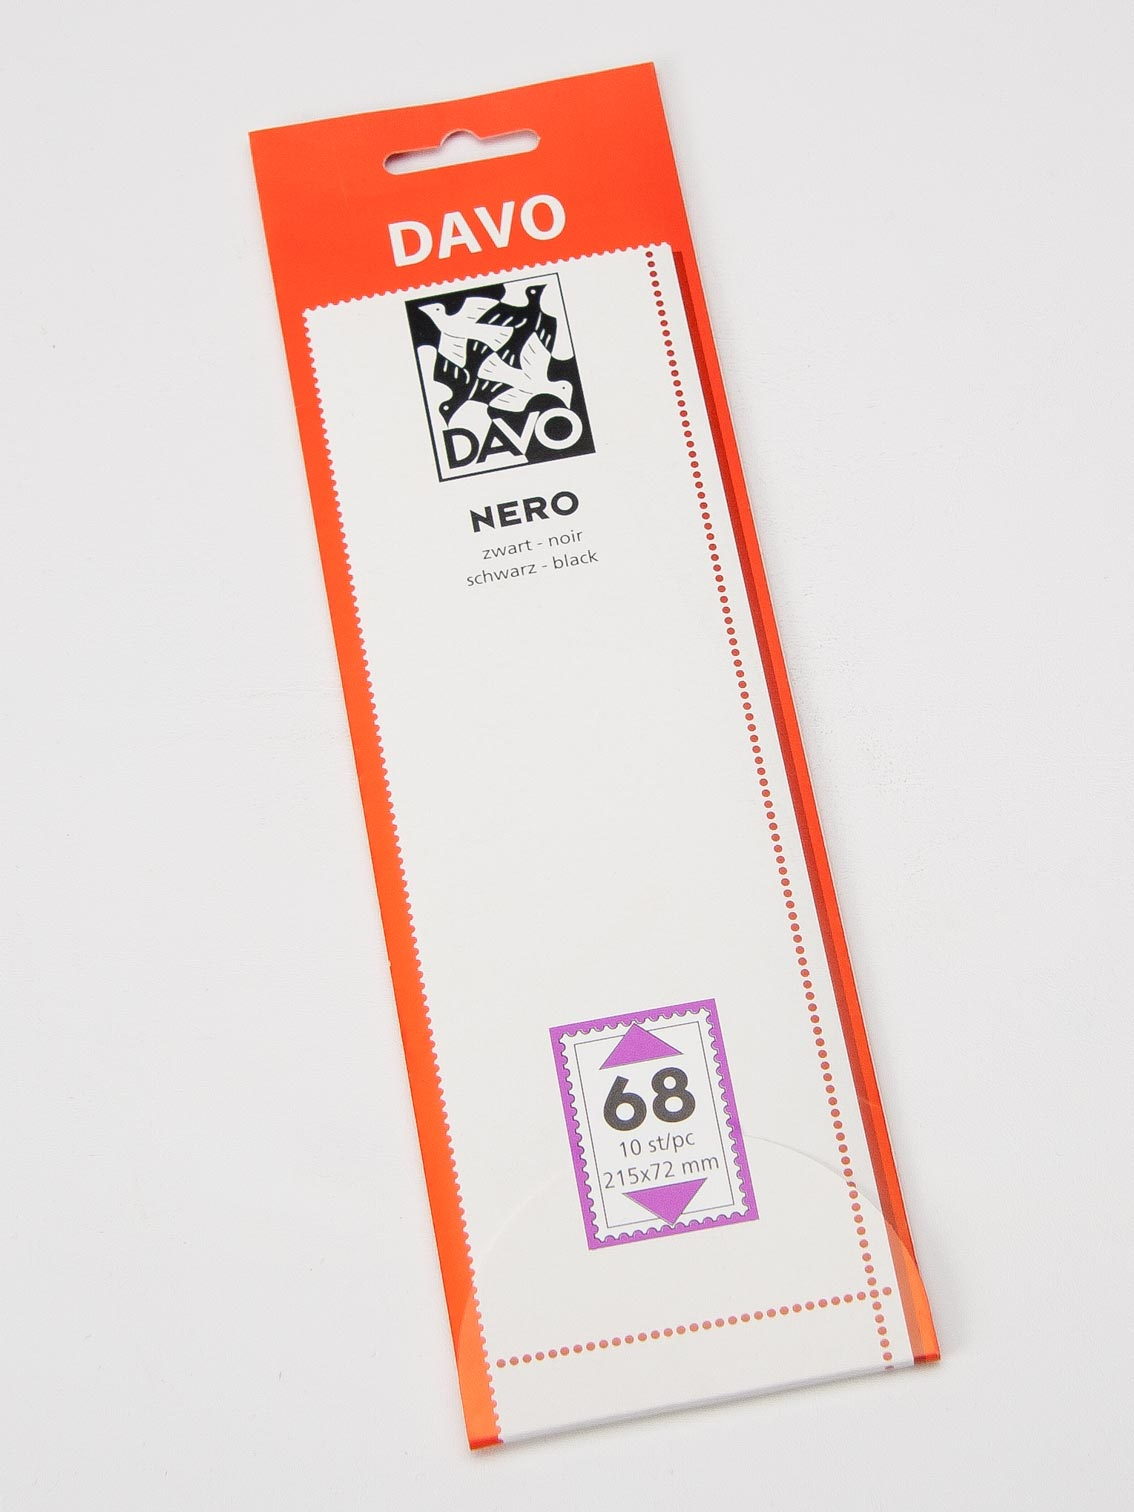 DAVO 21036 Nero mounts N36 18 pcs. 215 x 40